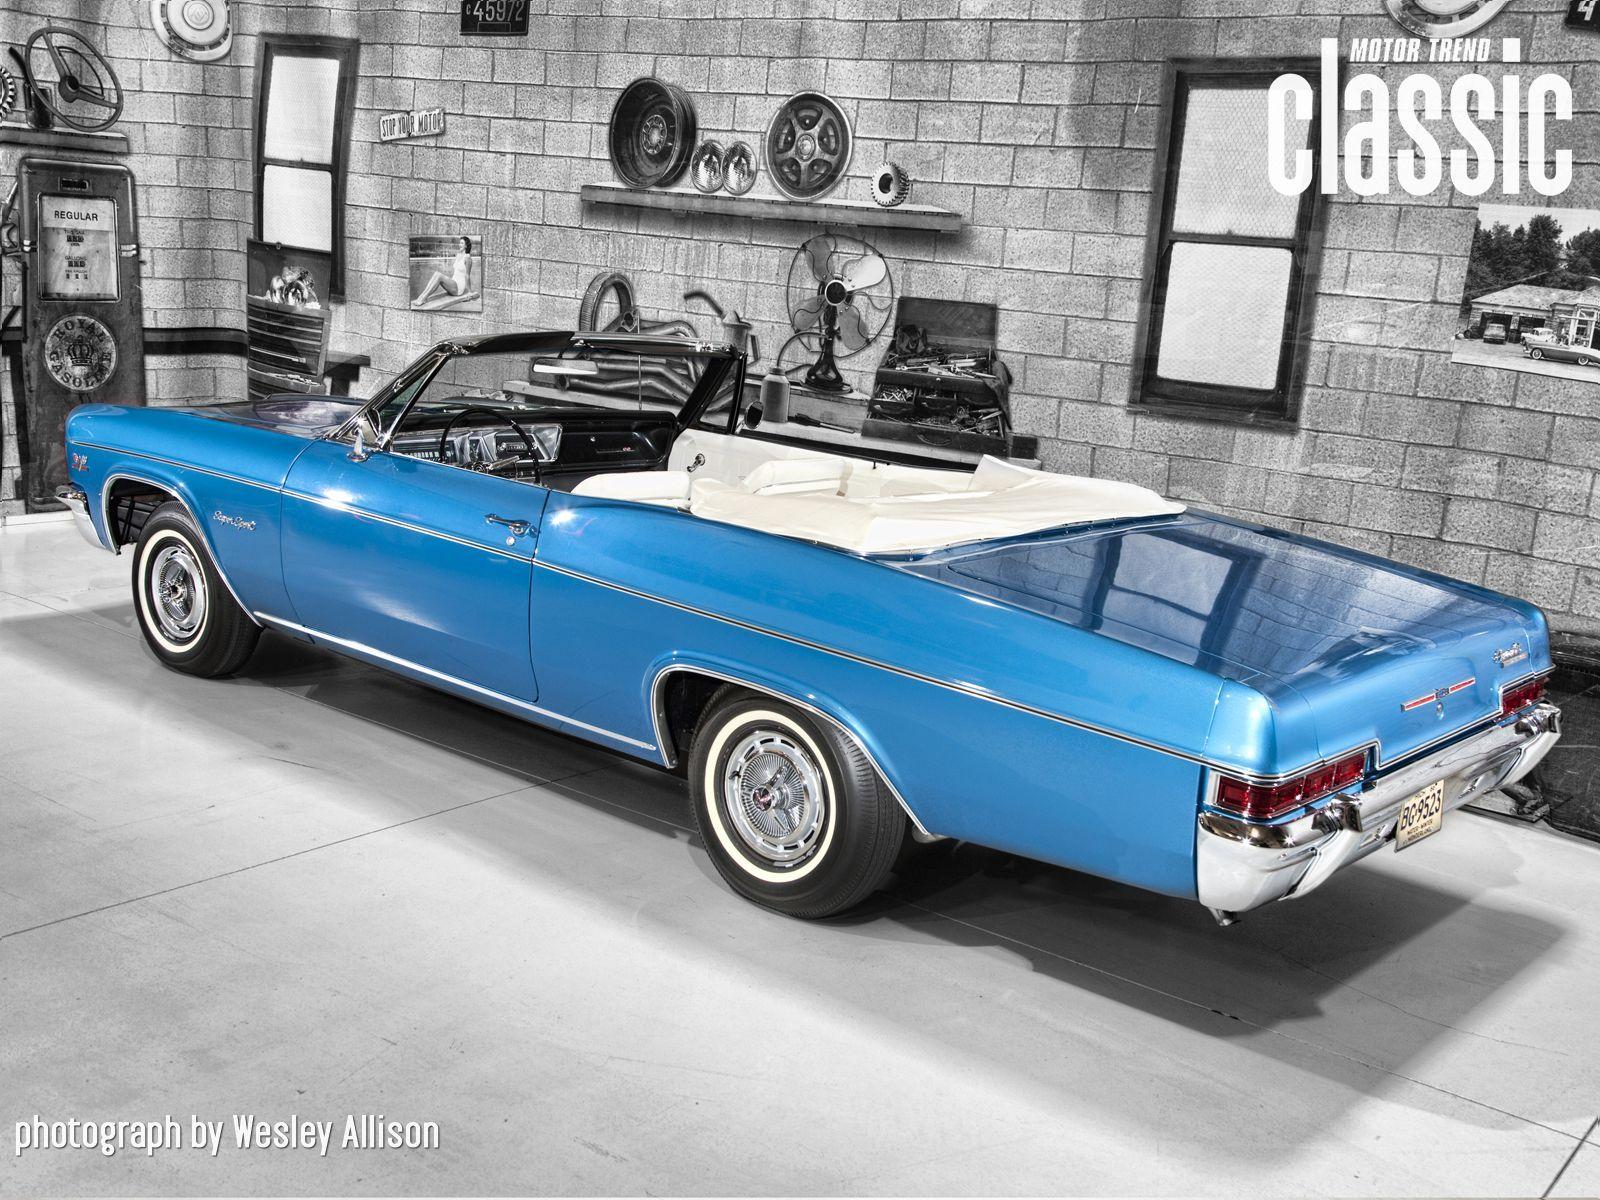 66 chevy impala ss wallpaper http wallpaperzoo com 66